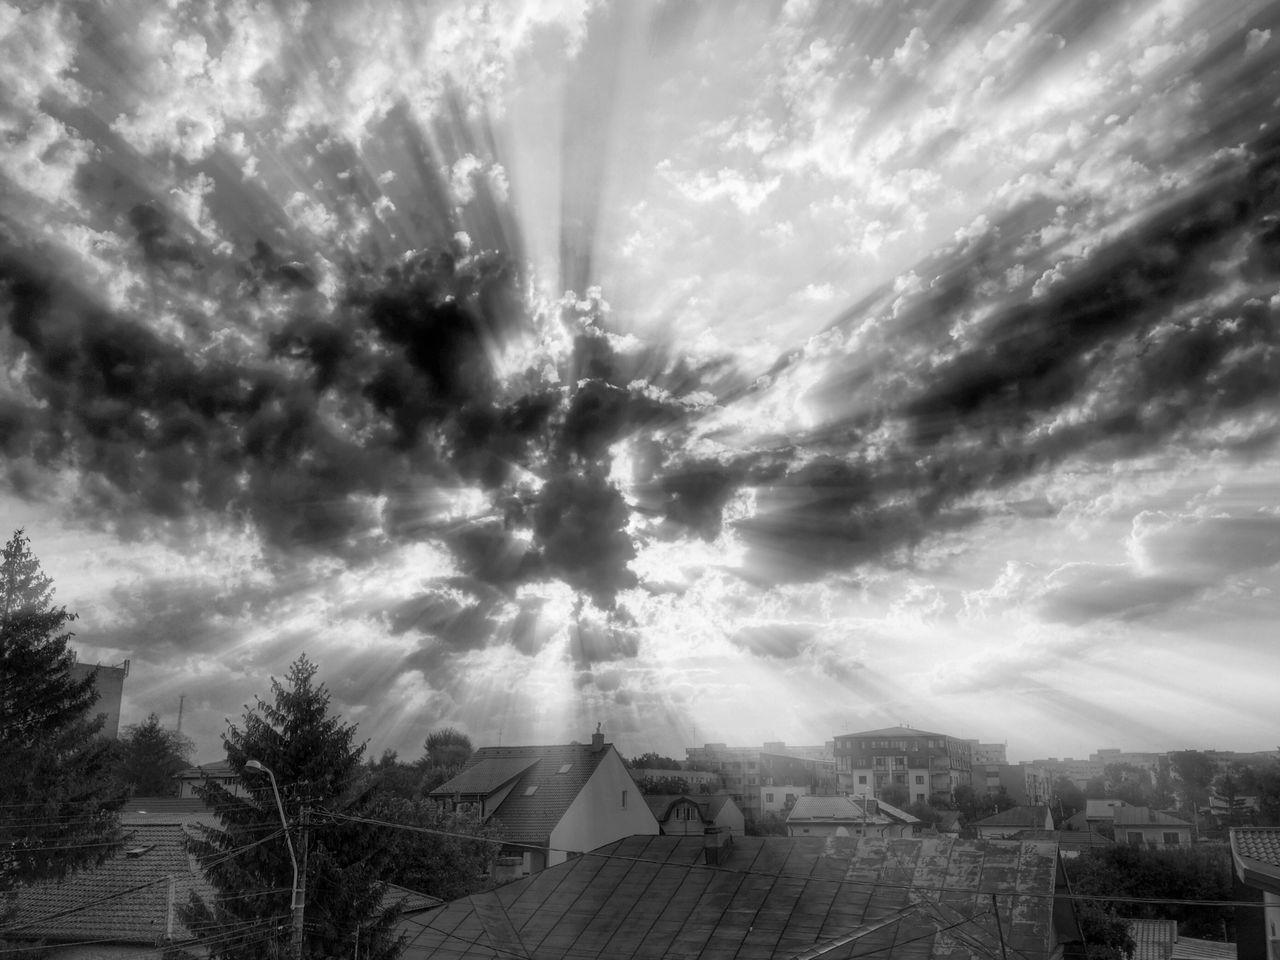 Bw series 012 Dramatic Sky Sunbeam VSCO Blackandwhite Vscocam Monochrome Black & White Photography Black And White IPhoneography Morning